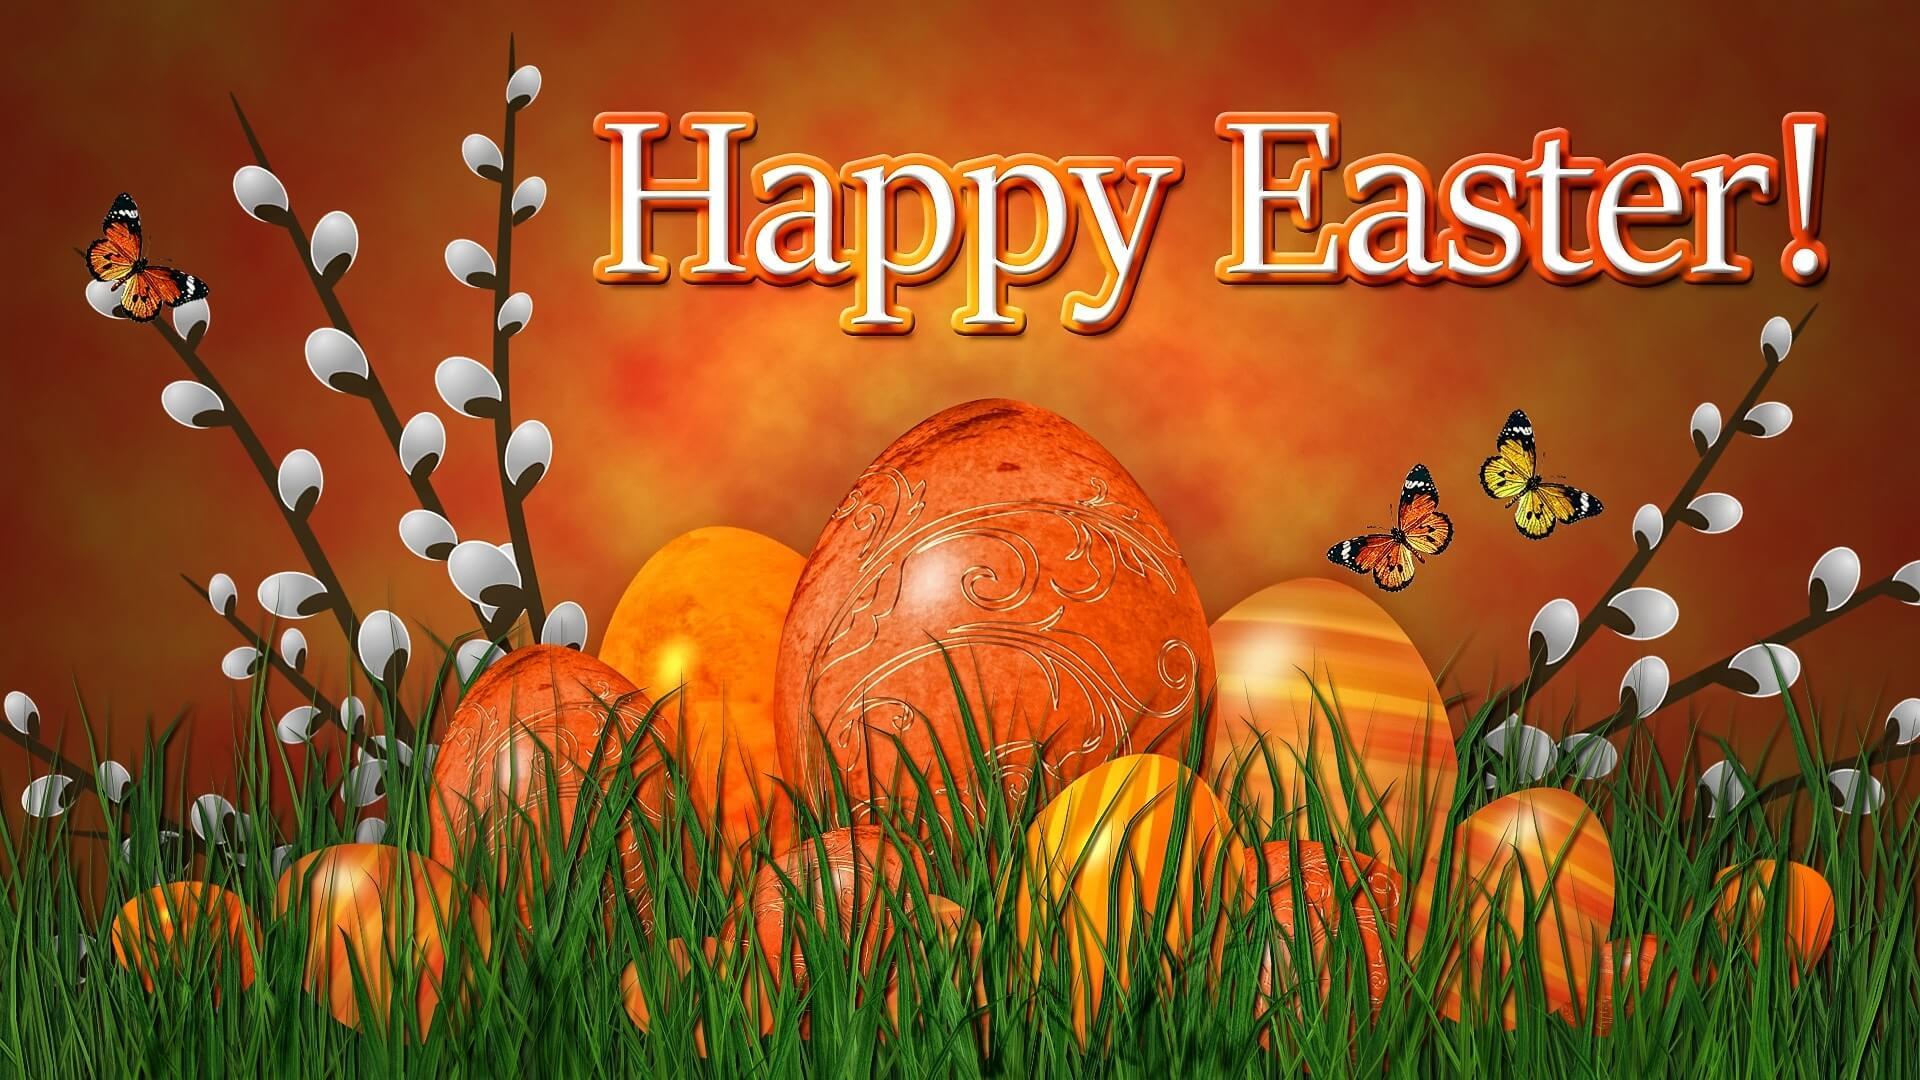 Easter free wallpaper 3D screensaver